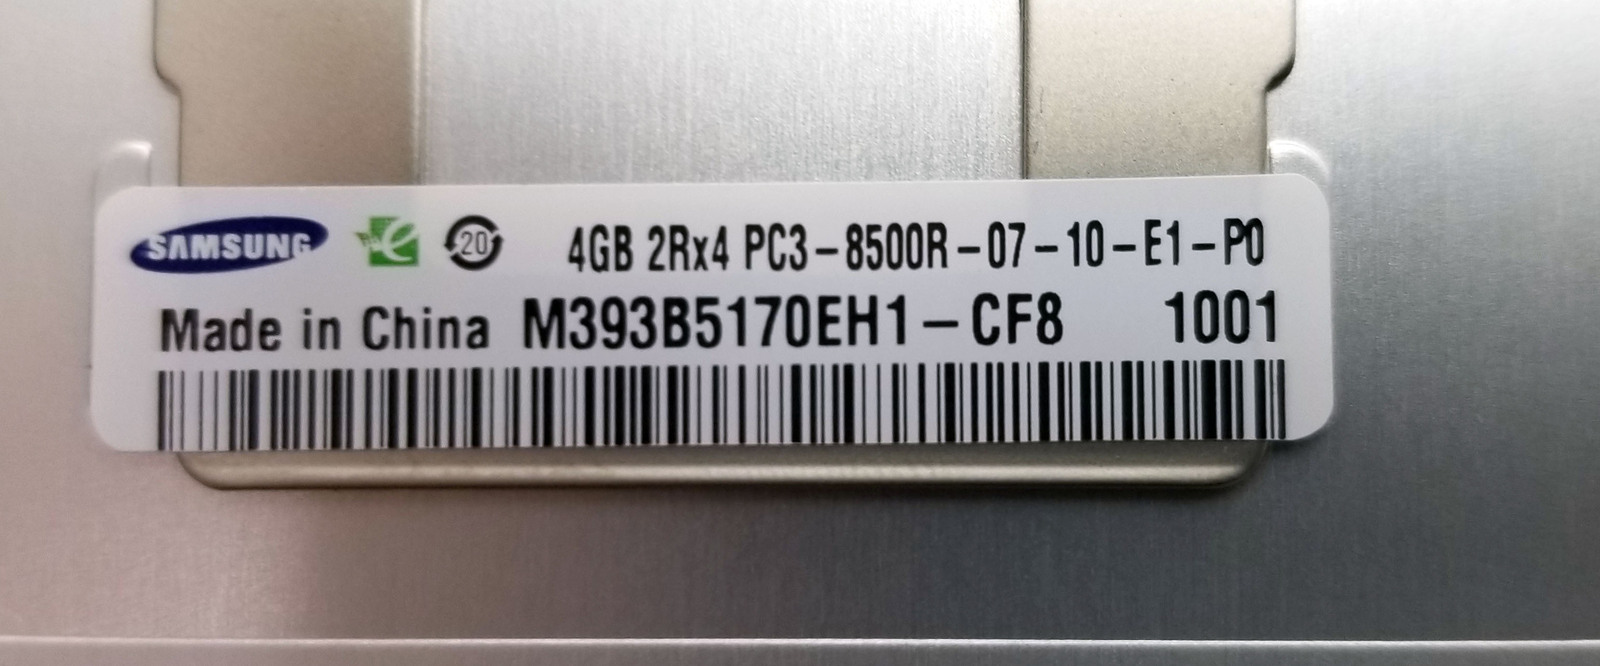 Samsung 4GB 2Rx4 PC3-8500R M393B5170EH1-CF8 Server Ram Bin:6